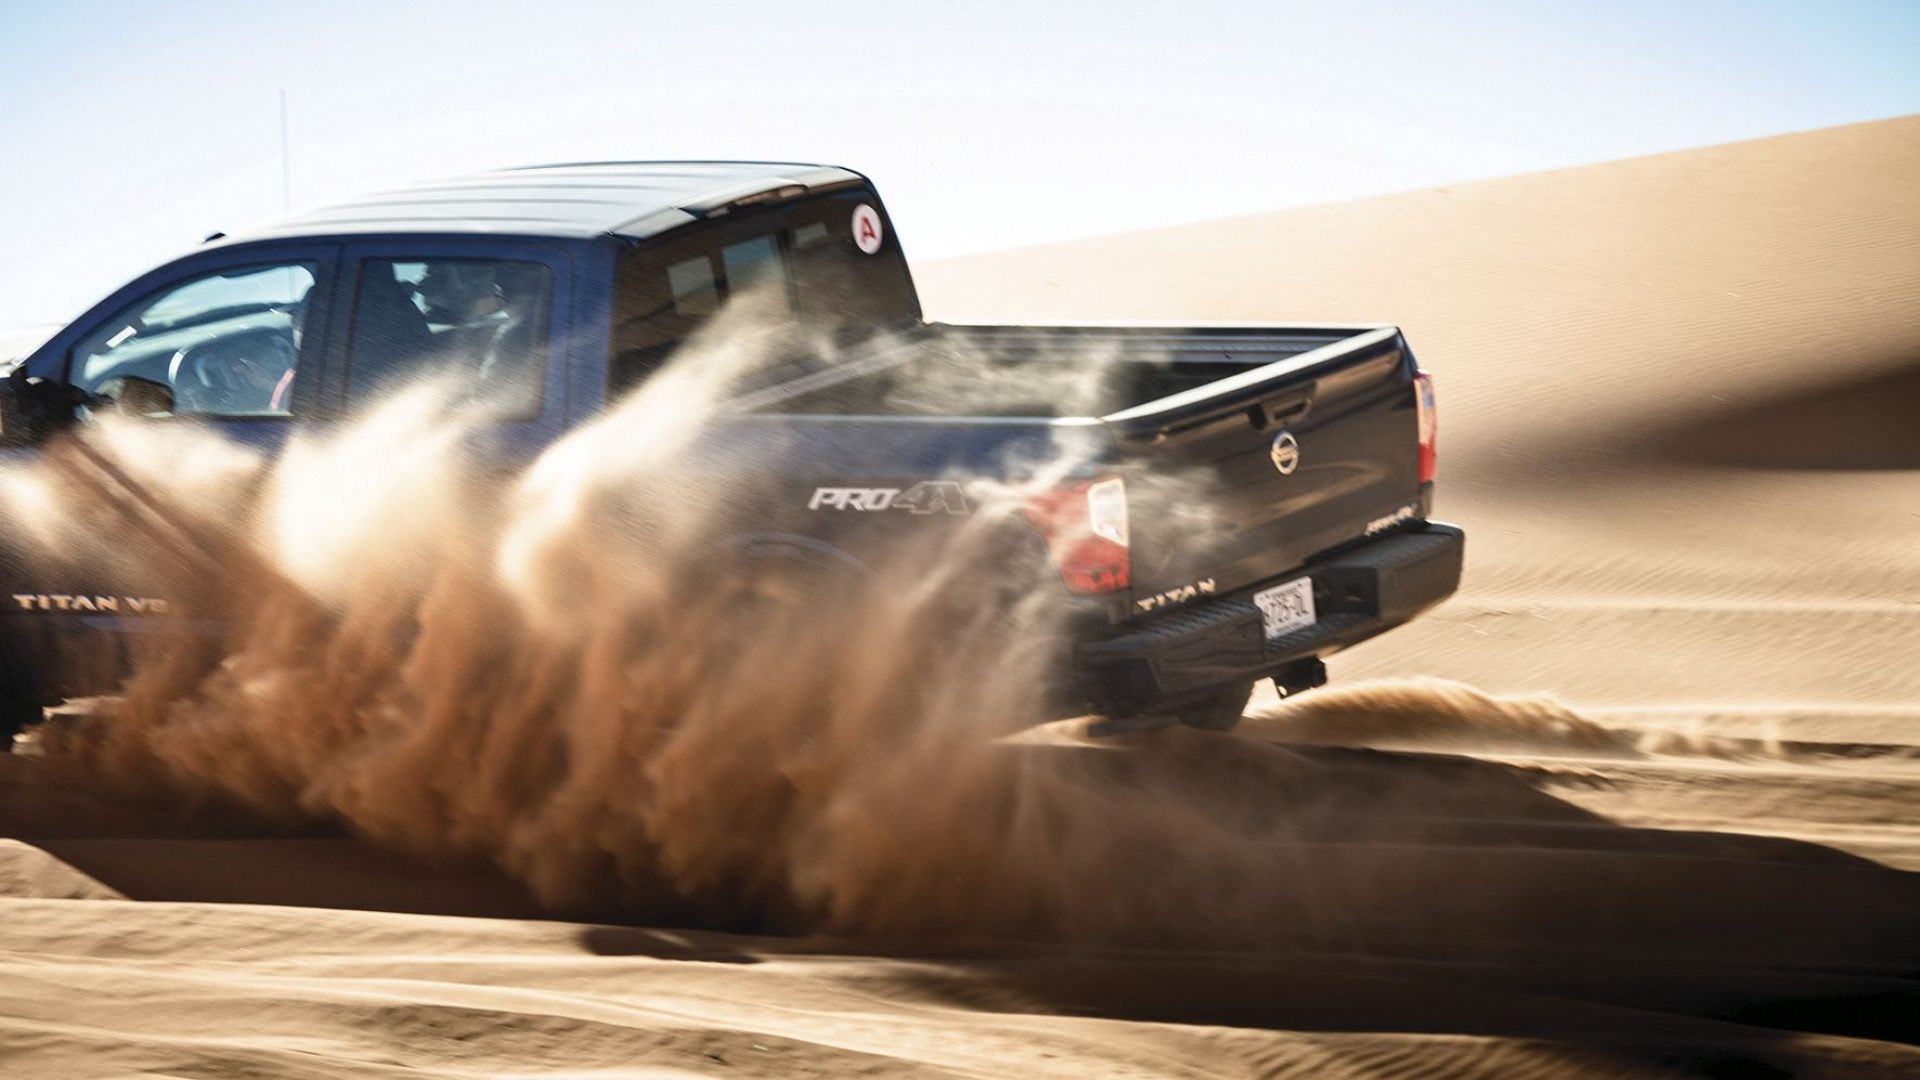 NissanMorocco_20181120_4J6A6782